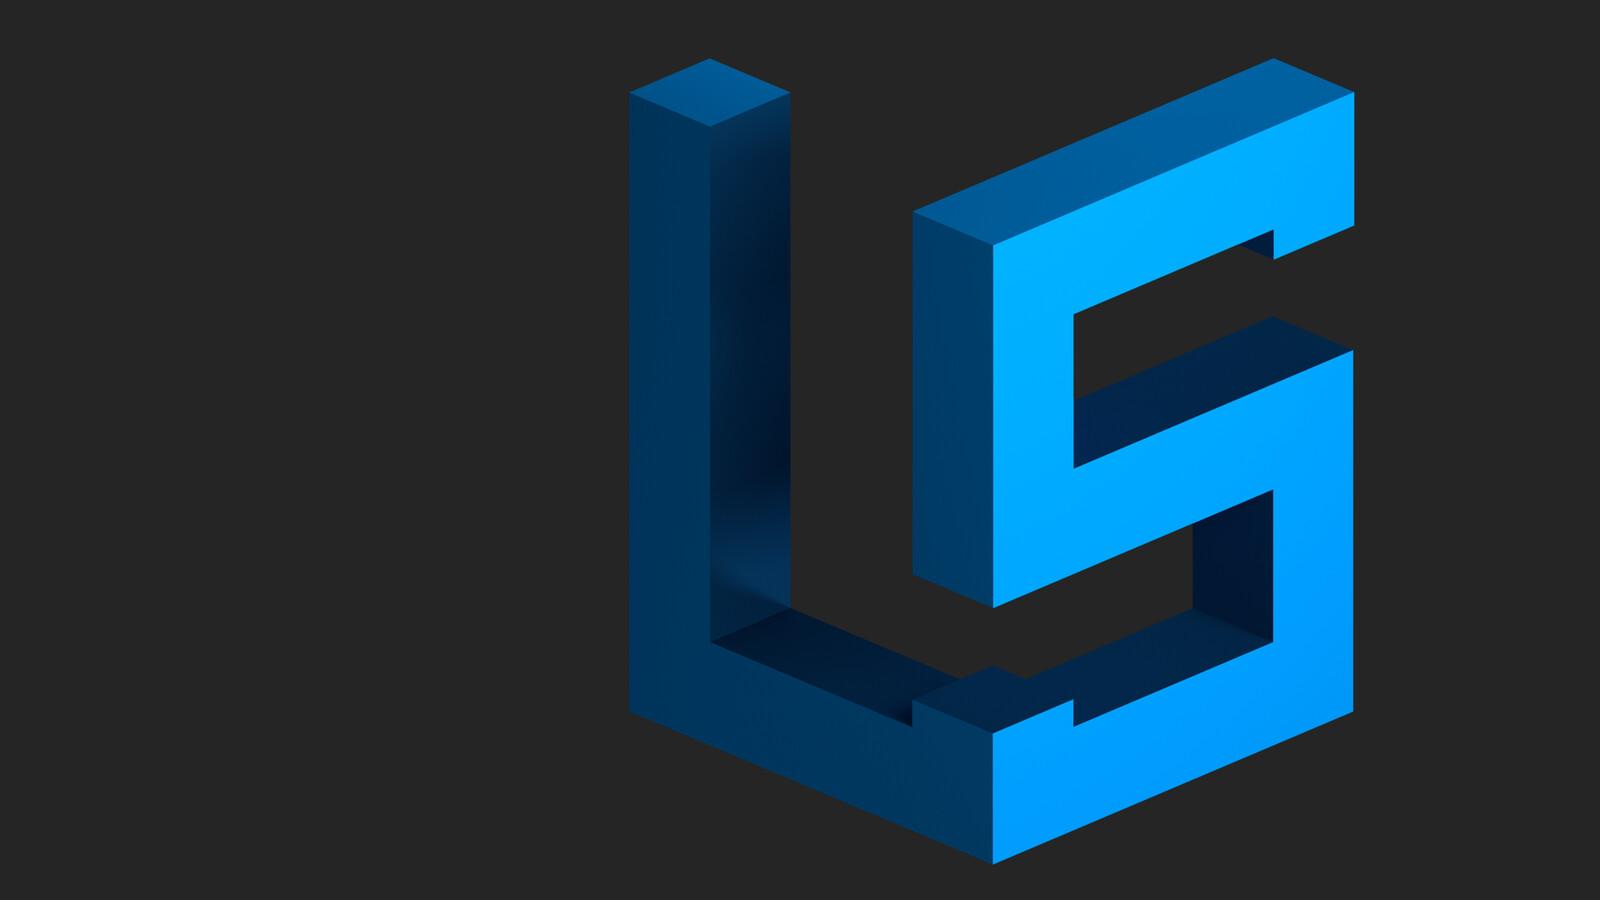 Logo image creation for promotion